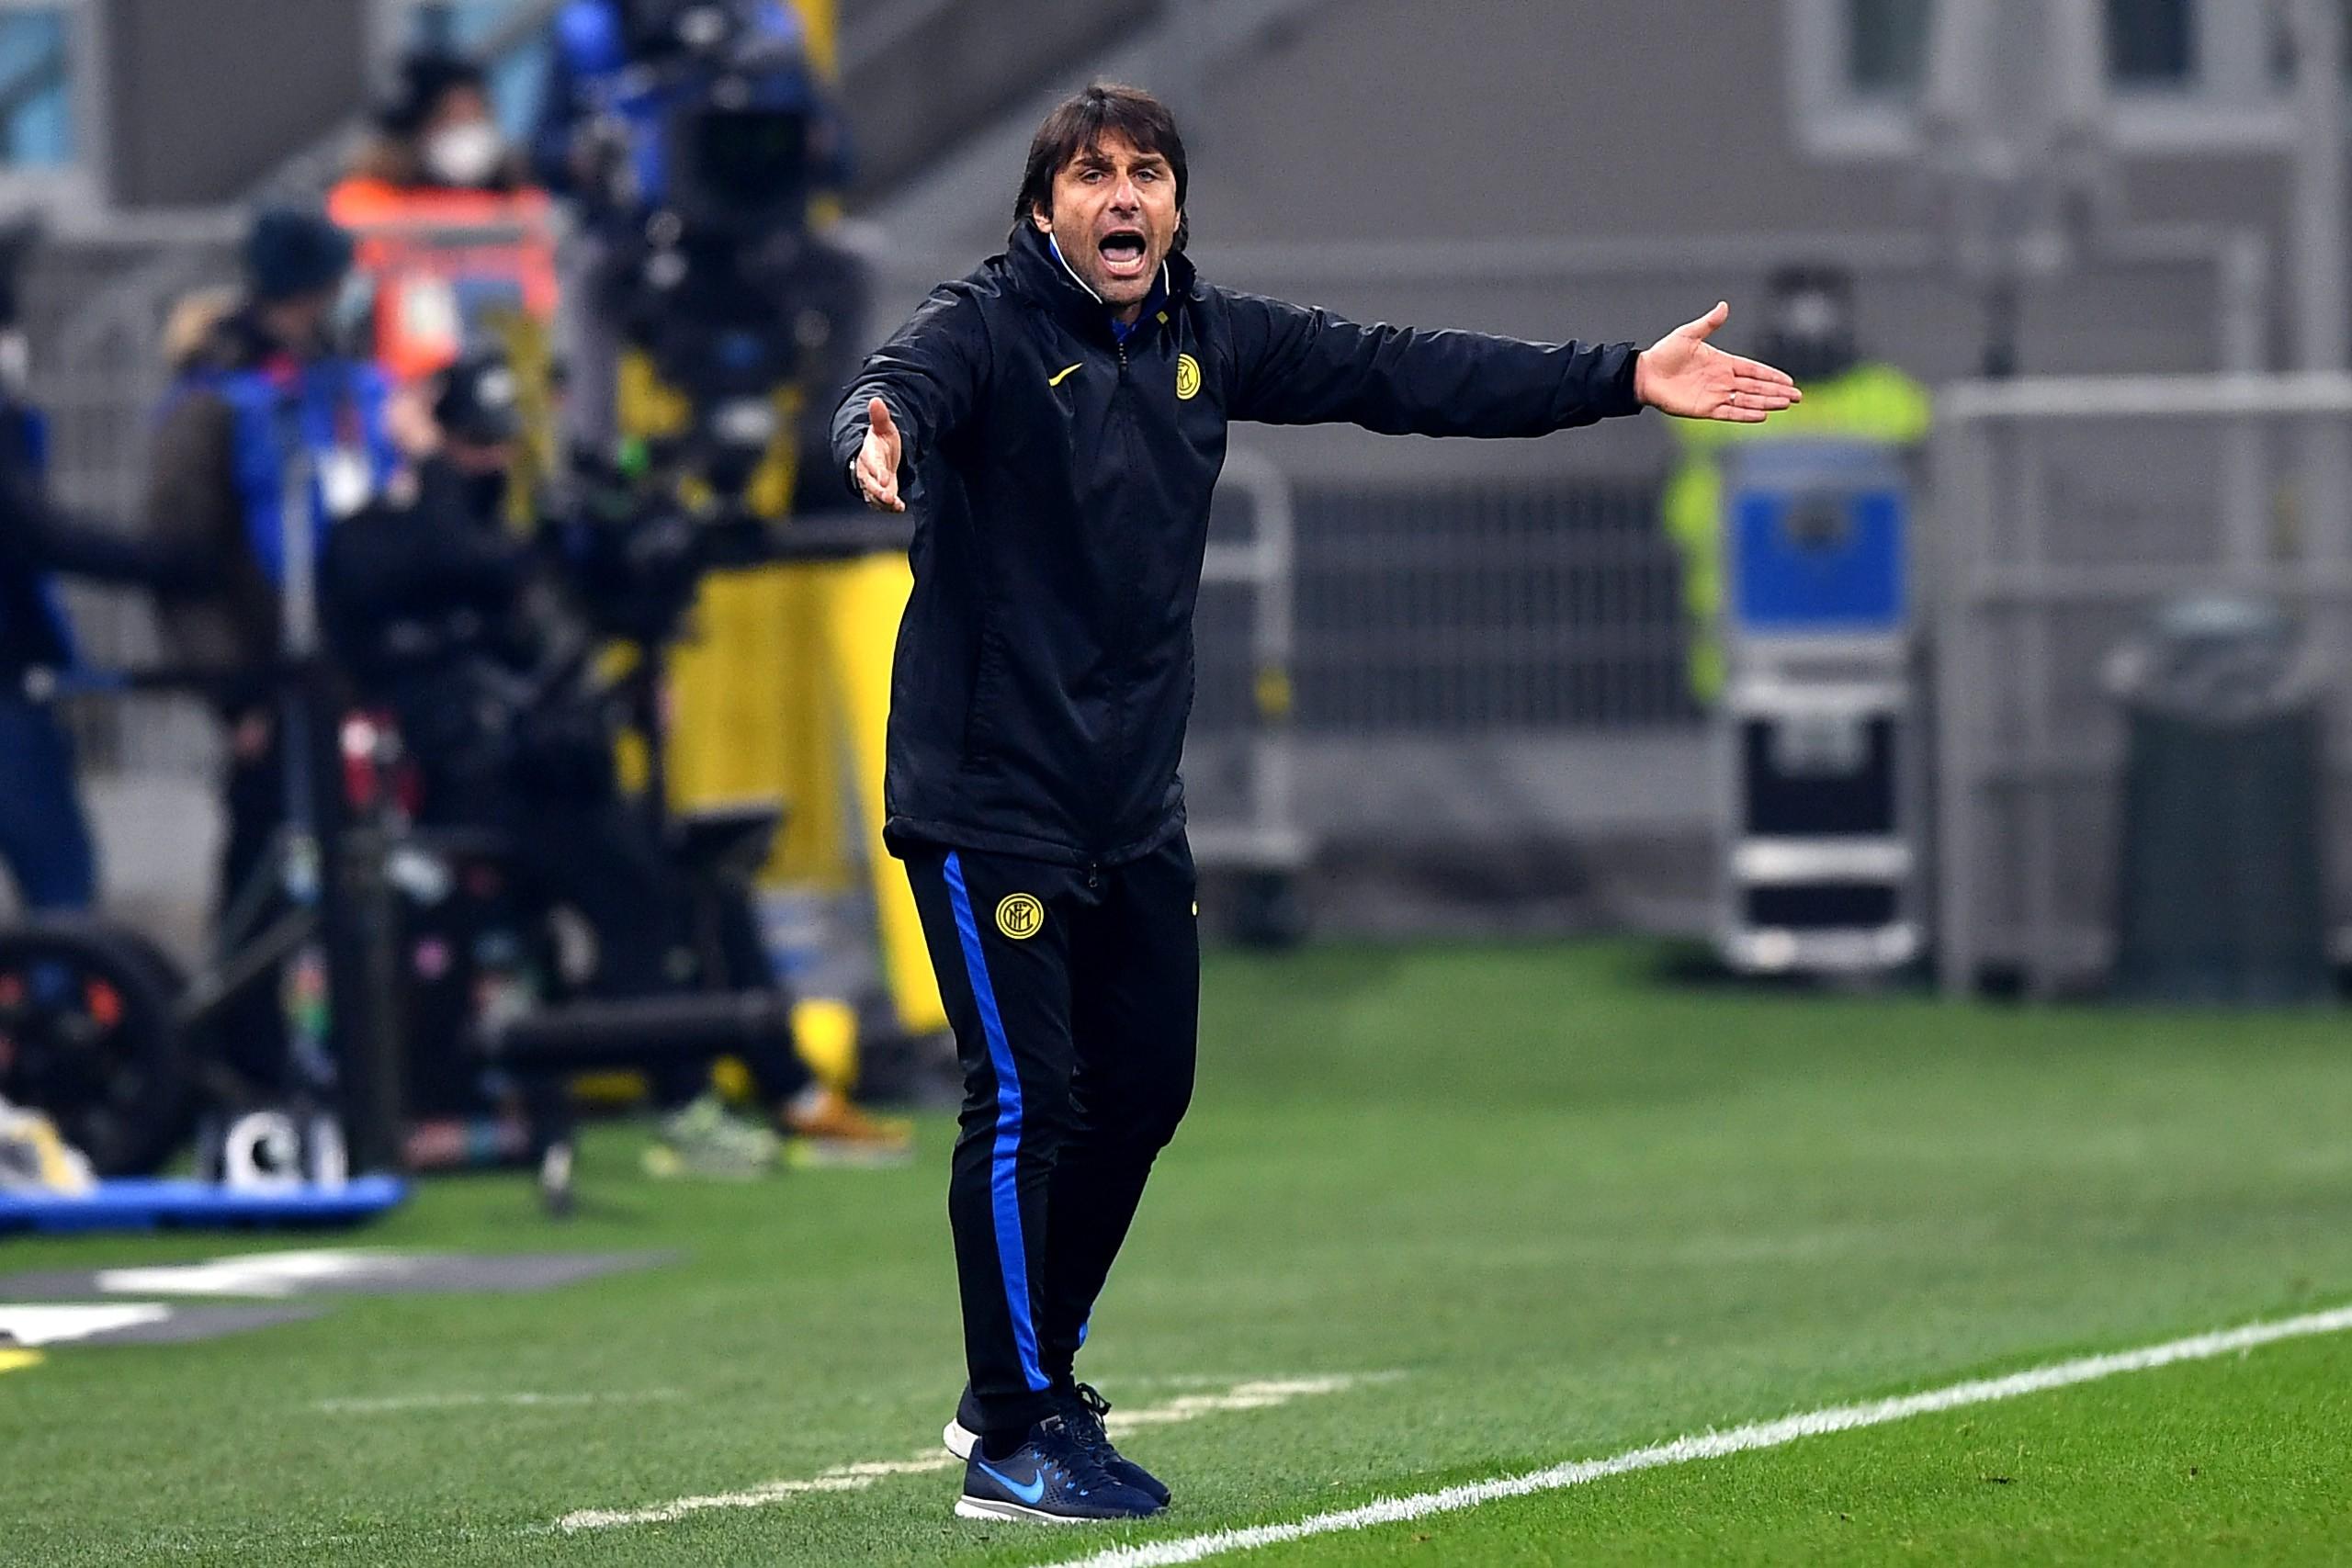 Tifosi Inter: No scambio con Eriksen, casomai scambiate Conte |  Sport e Vai